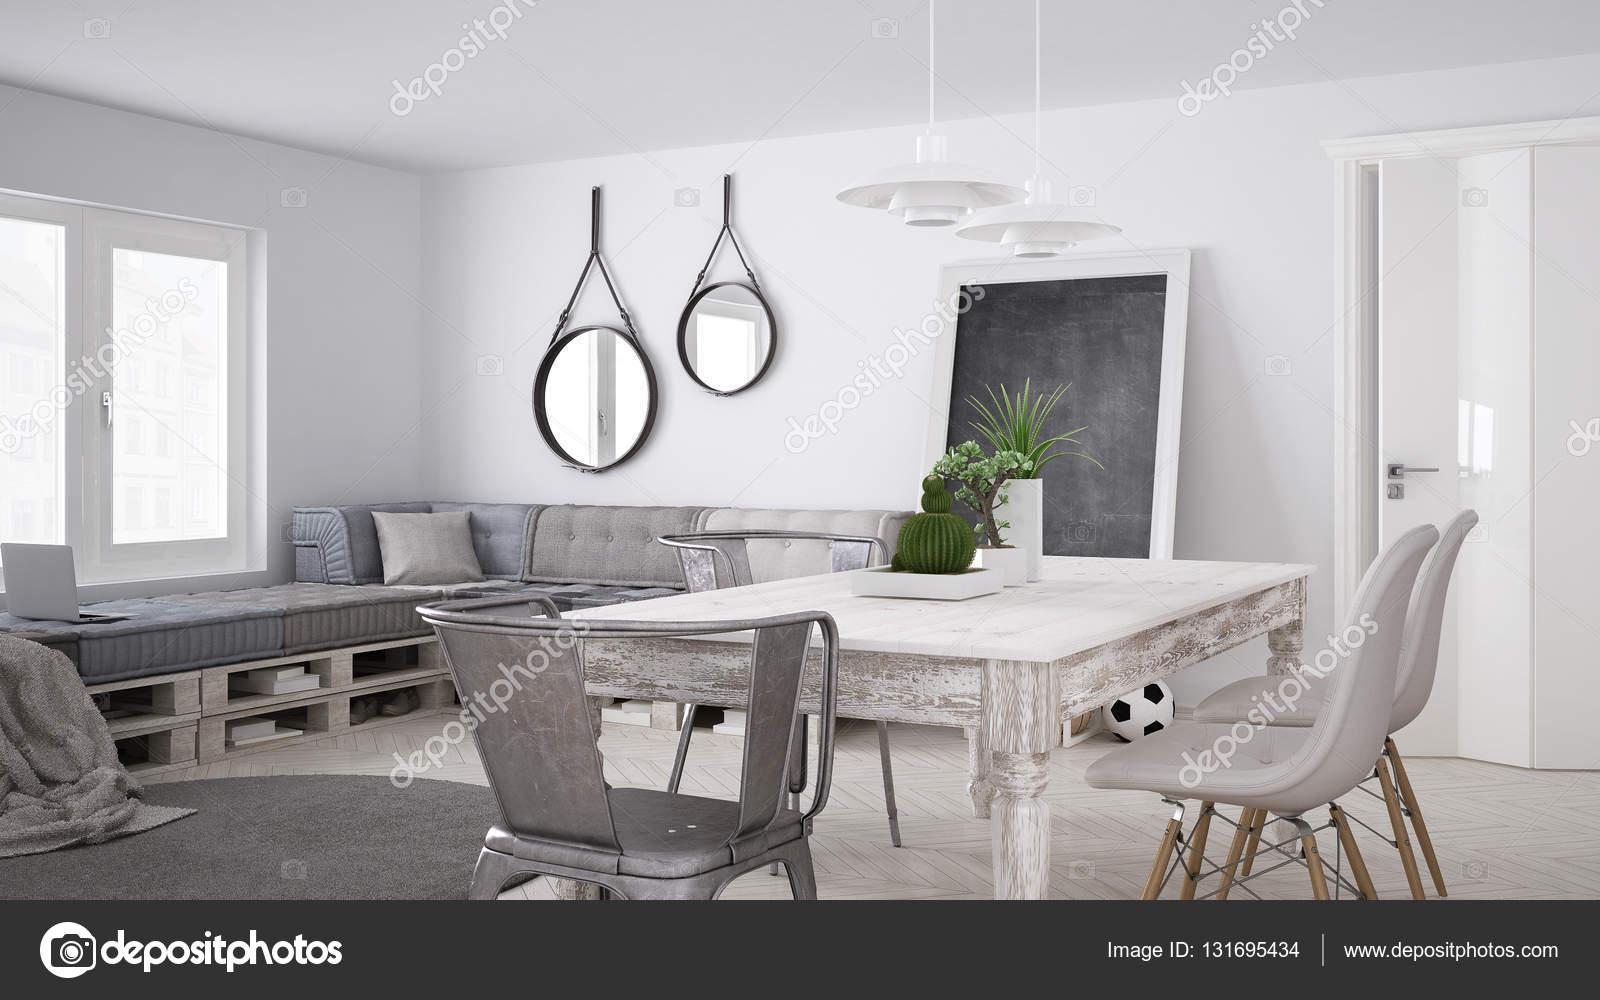 Divano Pallet Prezzo : Divano divano fai da te pallet scandinavo bianco vivono interni